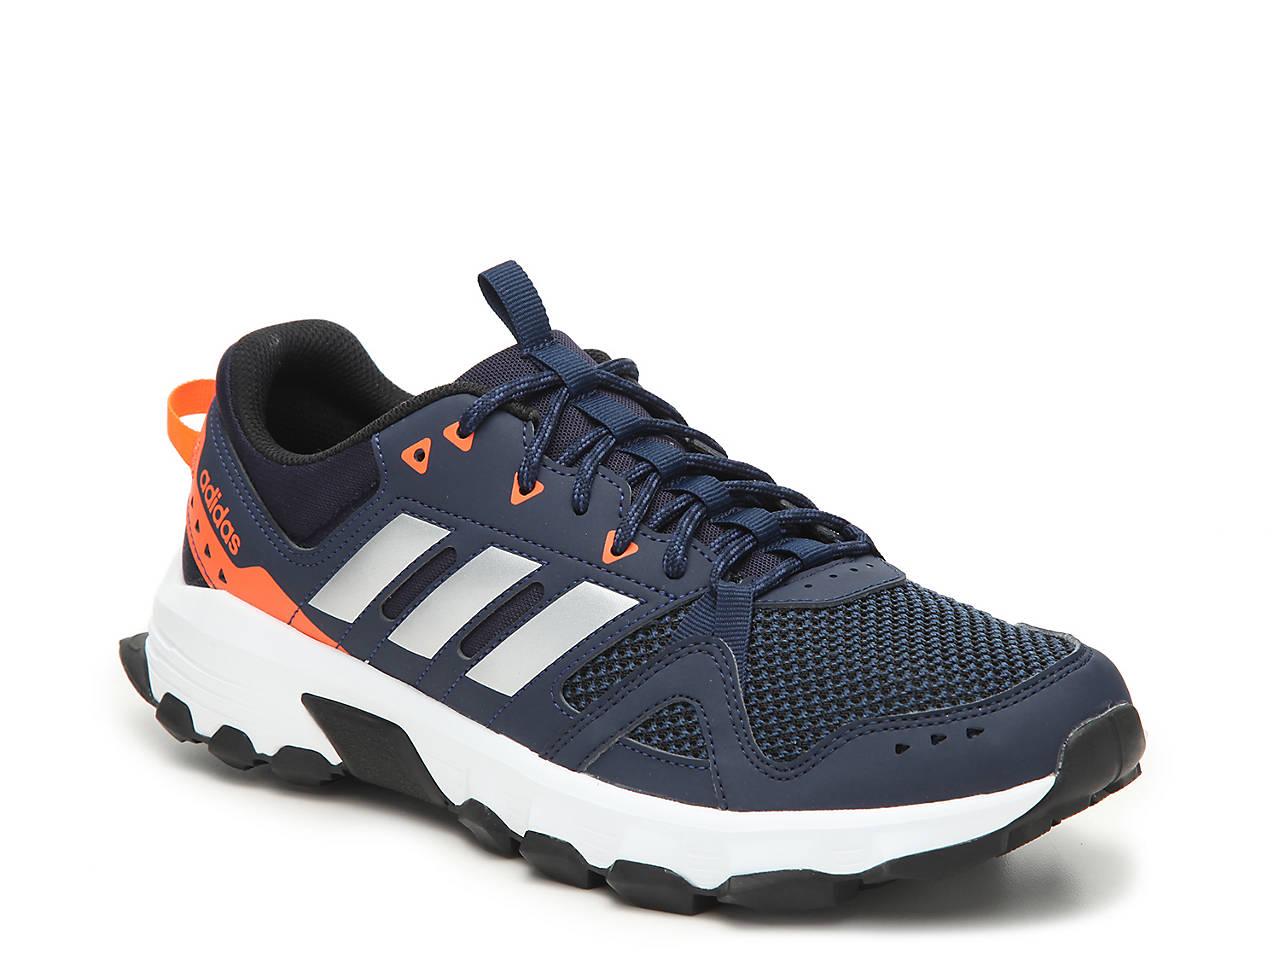 d4deec861 adidas Rockadia Trail Running Shoe - Men s Men s Shoes